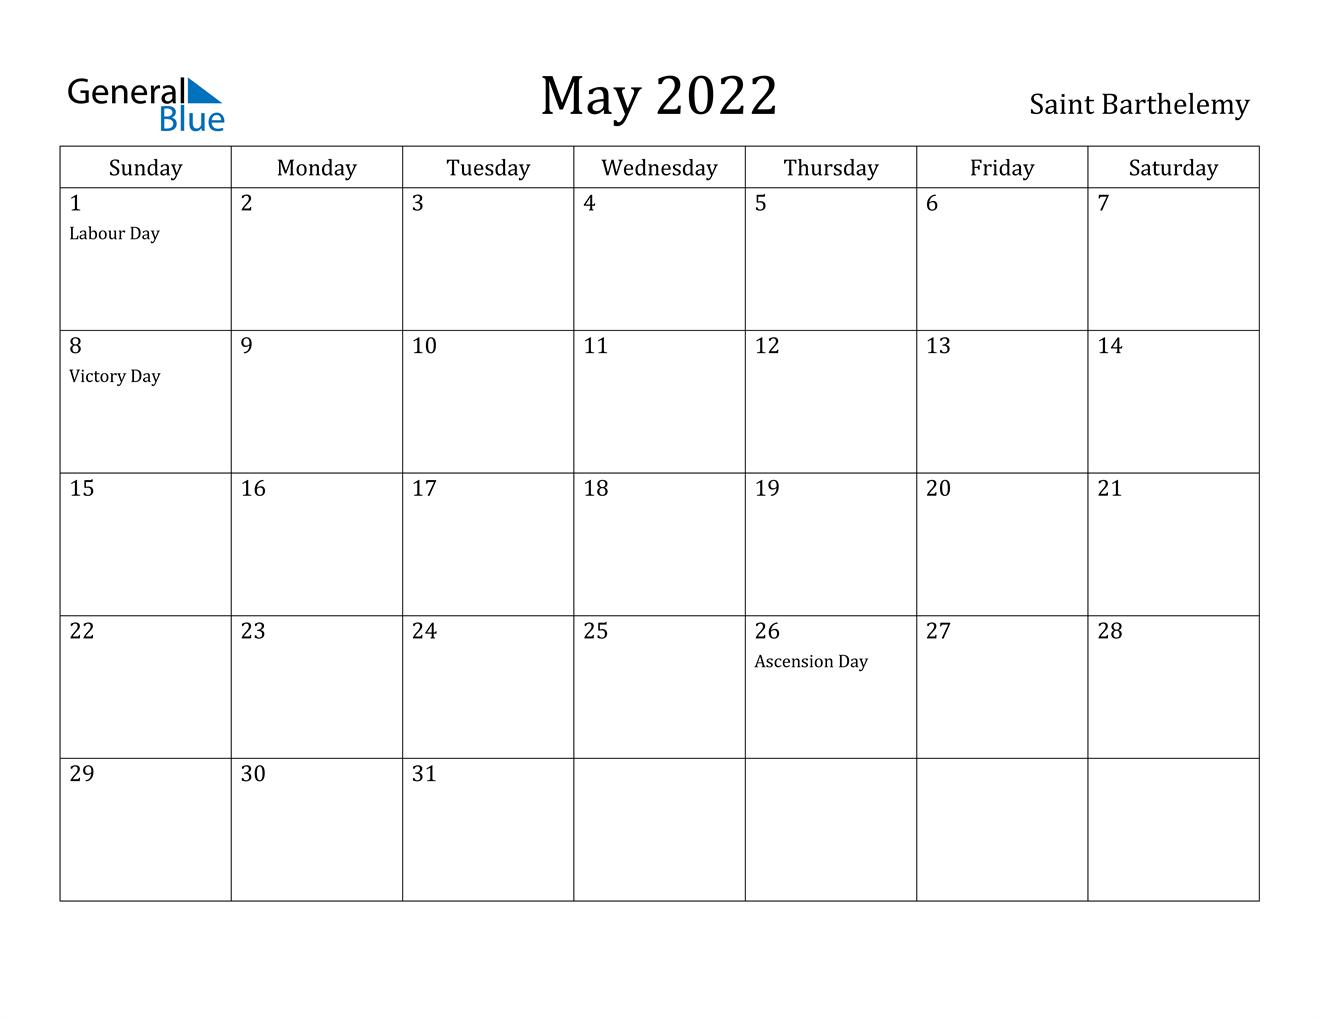 May 2022 Calendar - Saint Barthelemy